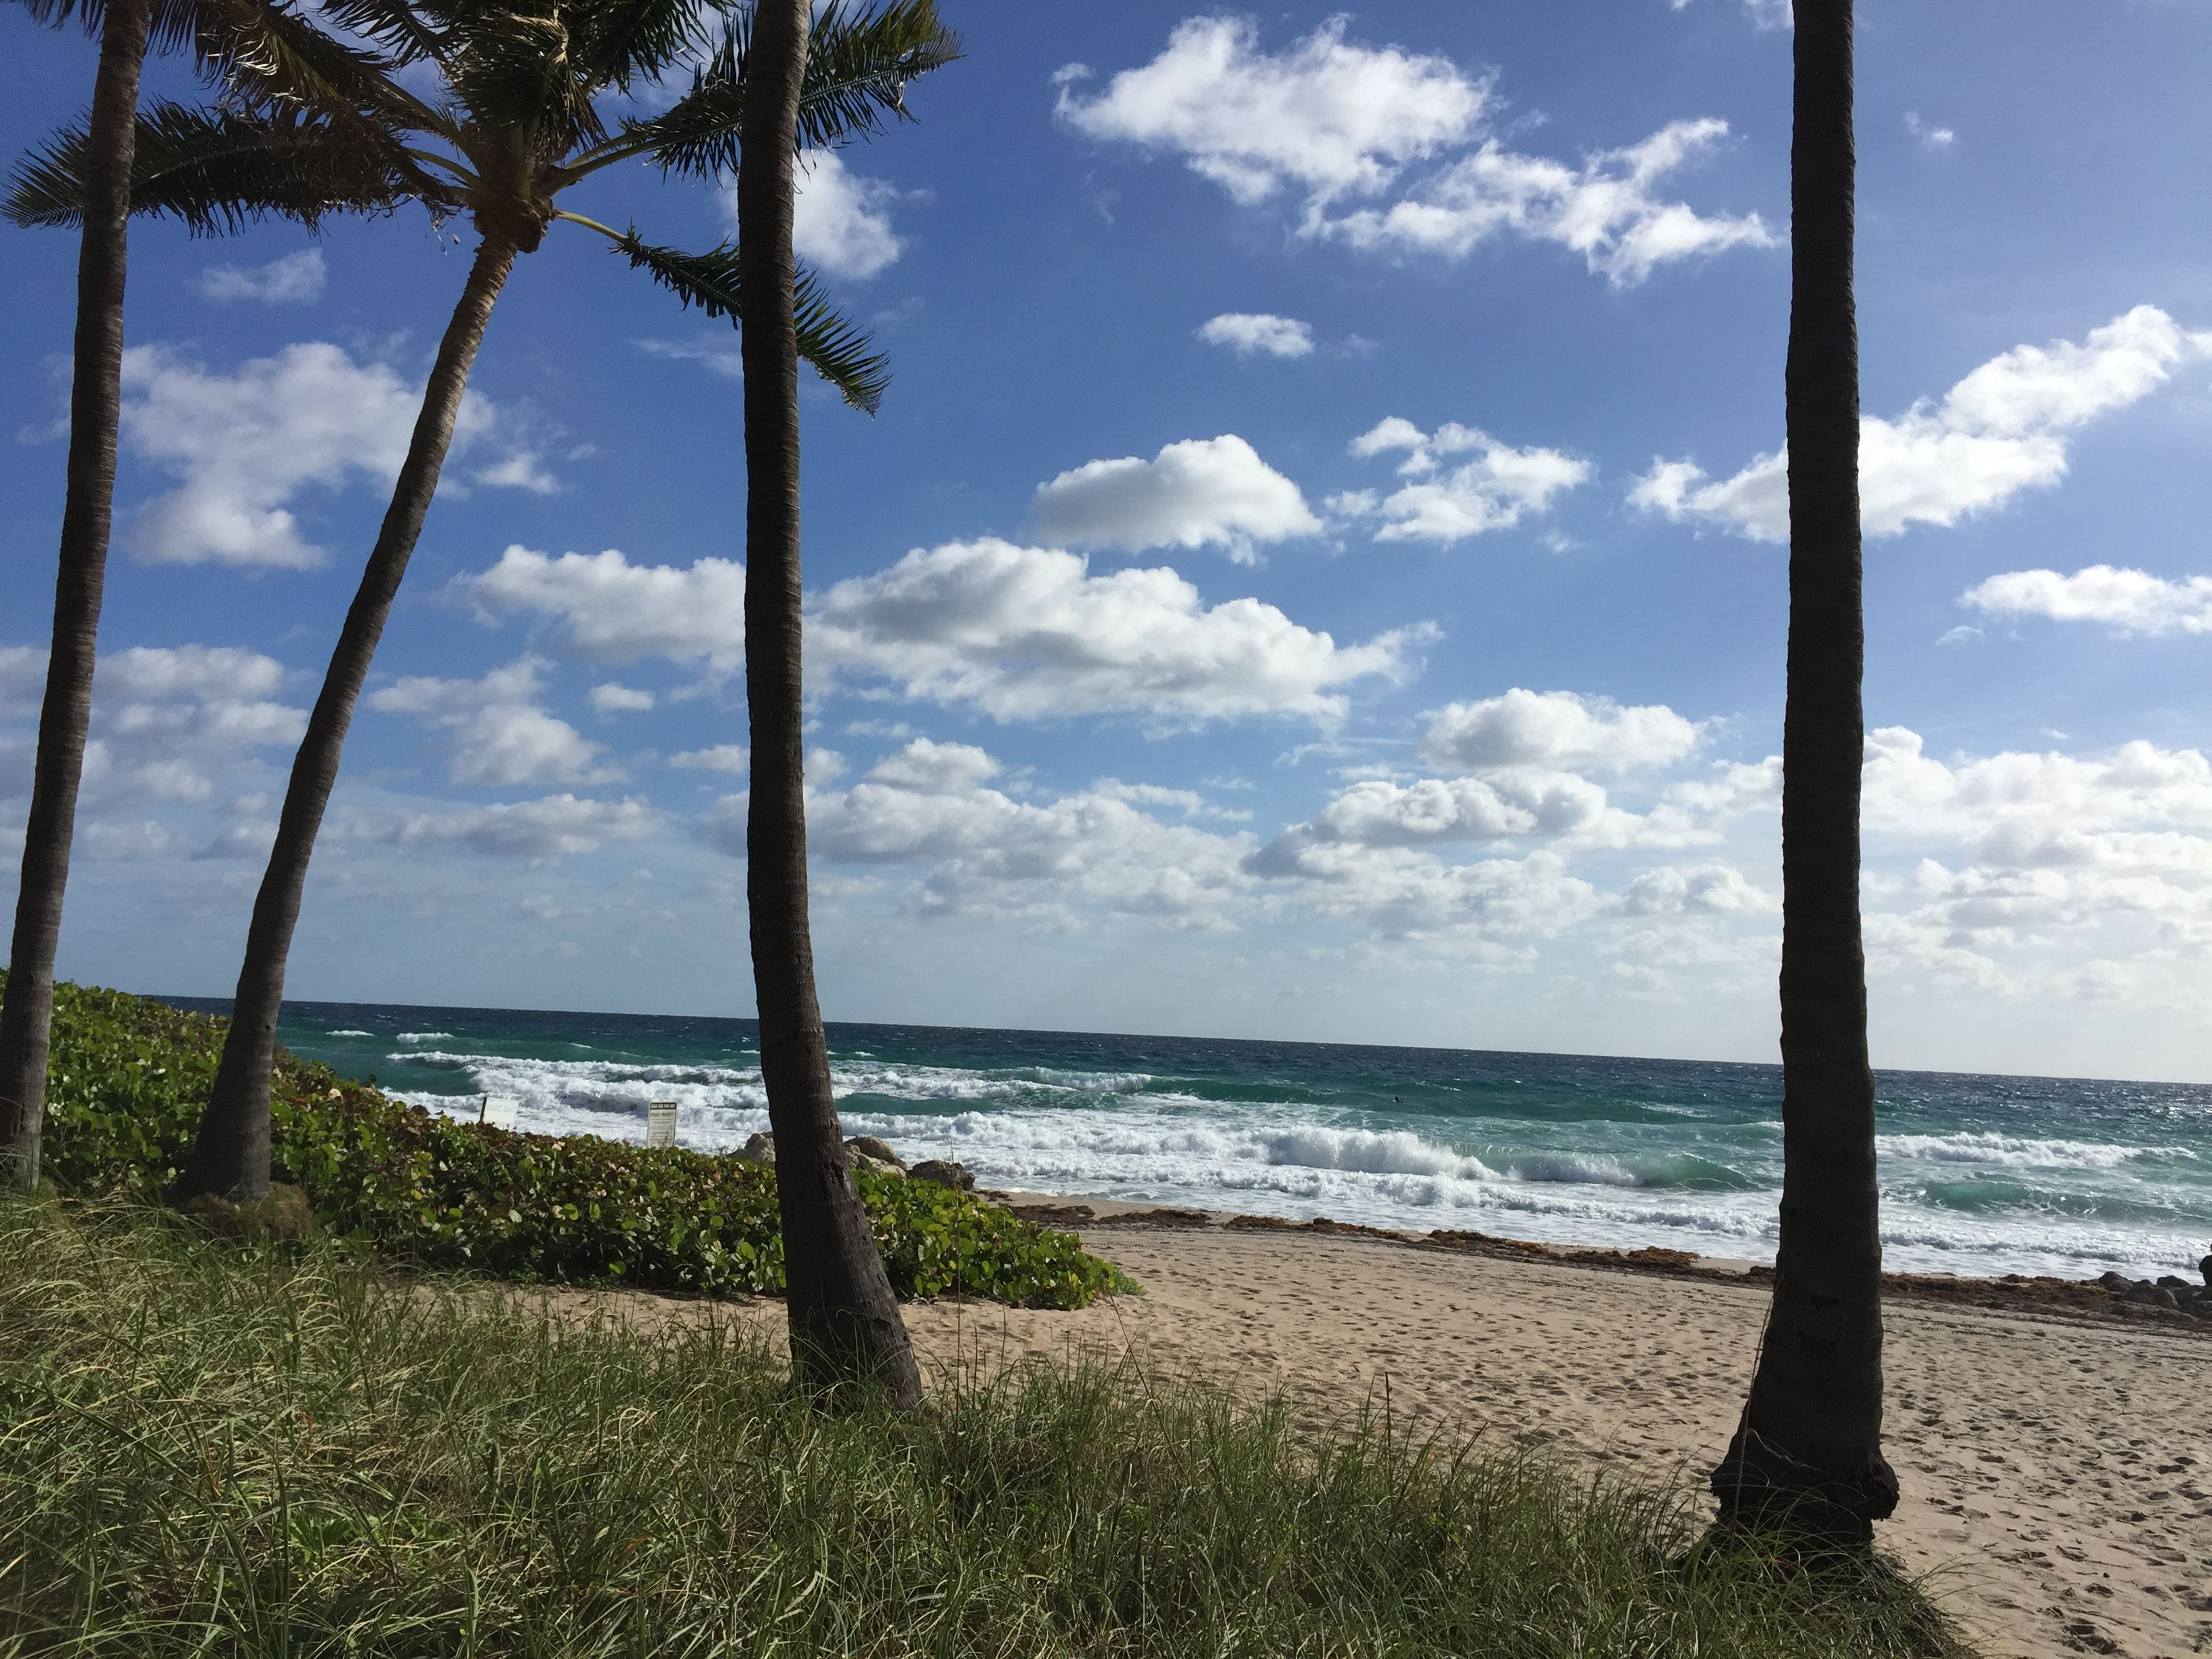 Pin by Christine Coyle on Deerfield Beach Florida | Pinterest ...